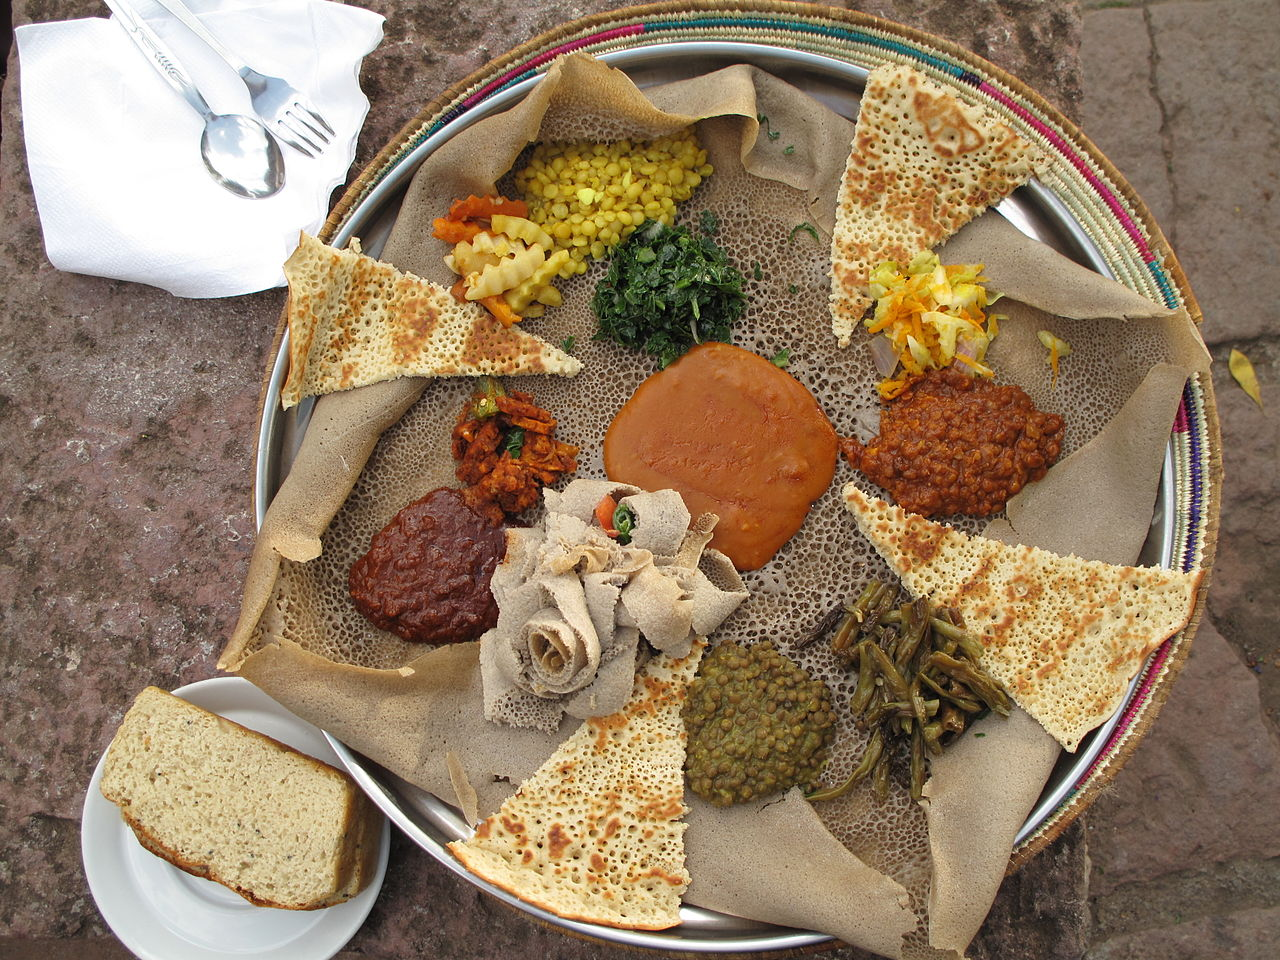 Injera vegan dishes in Ethiopia